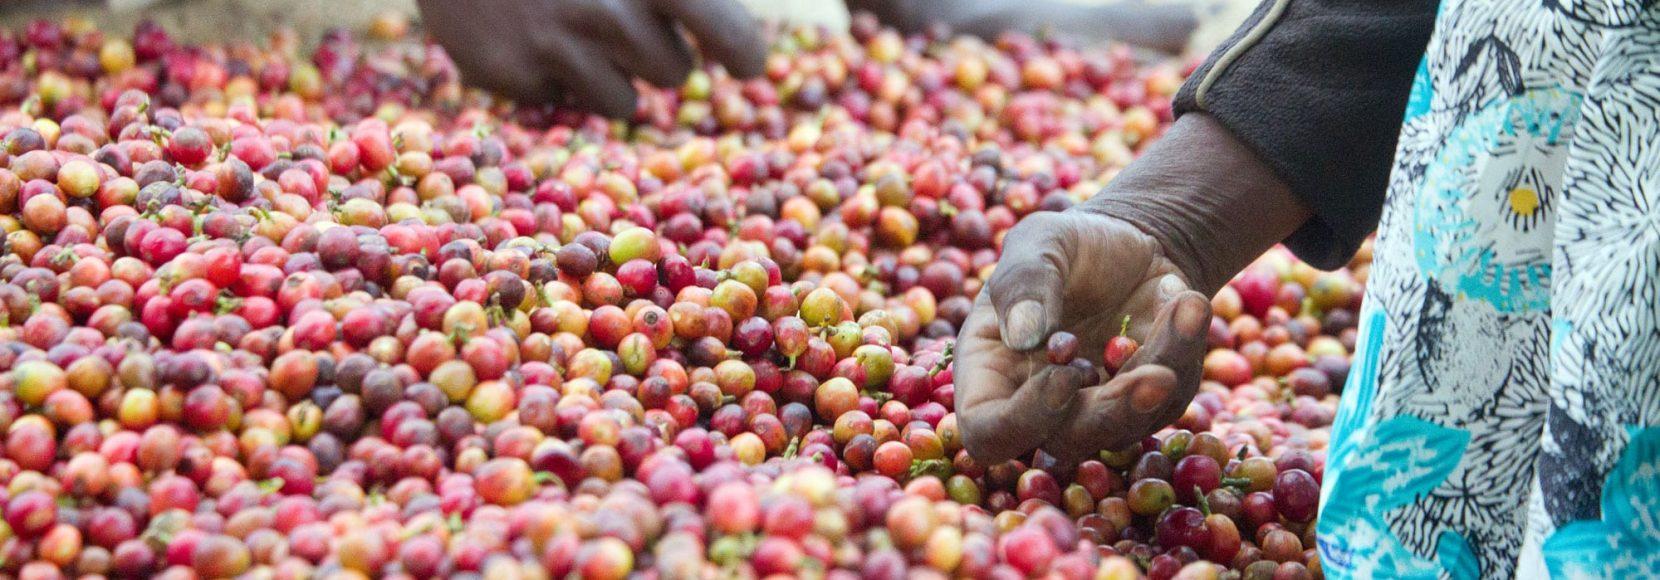 People picking up coffee cherries